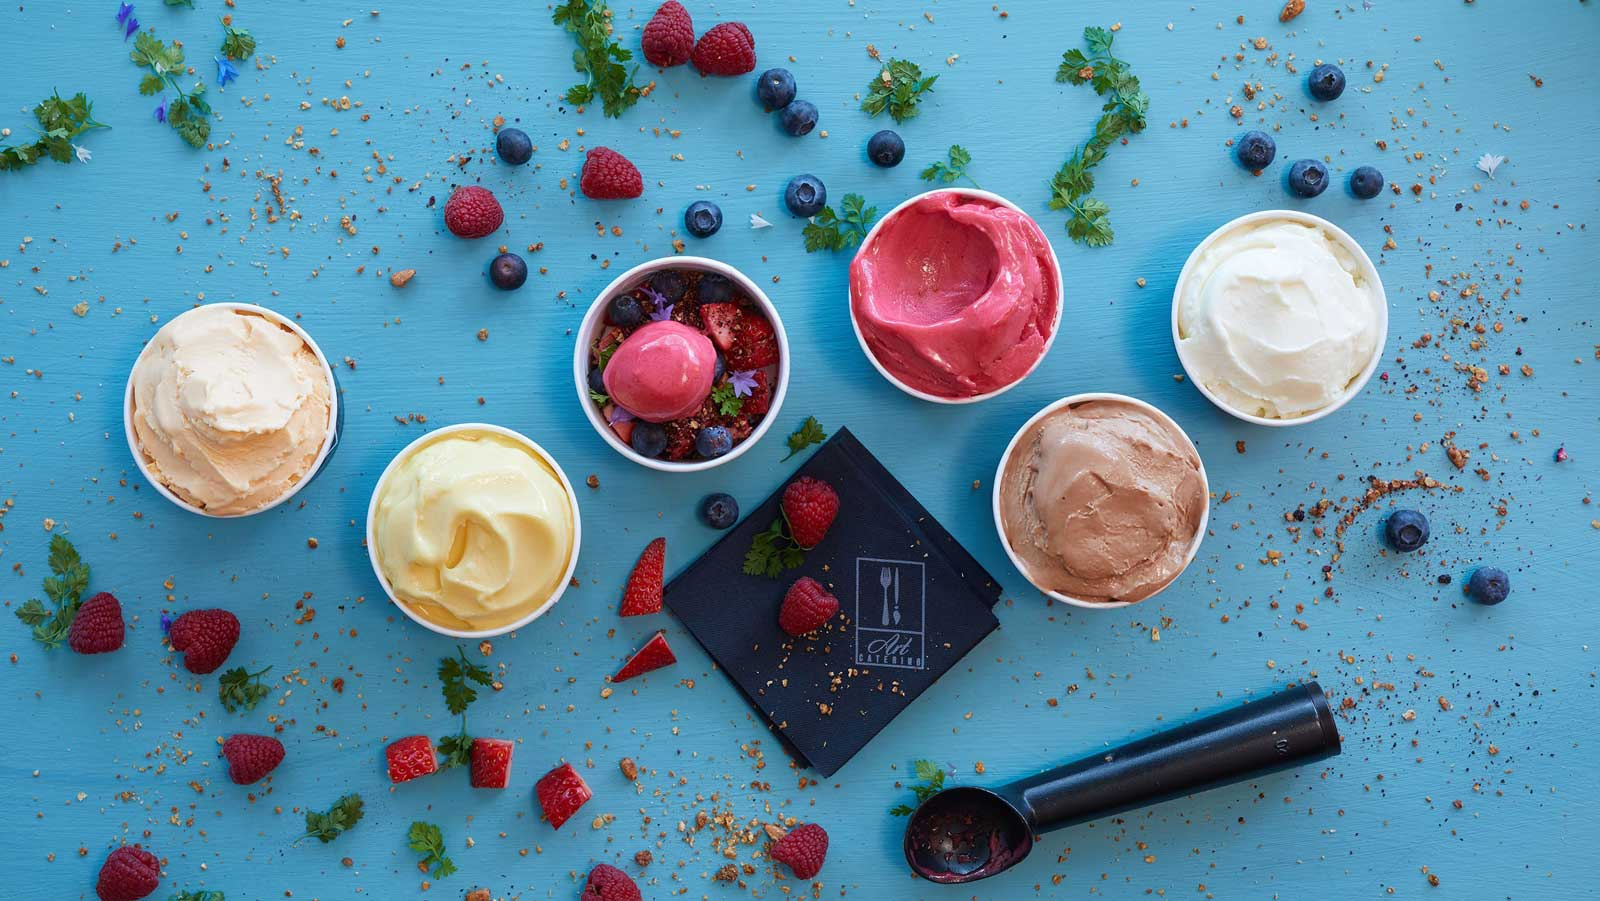 Art Gelato ice cream flavours and berries